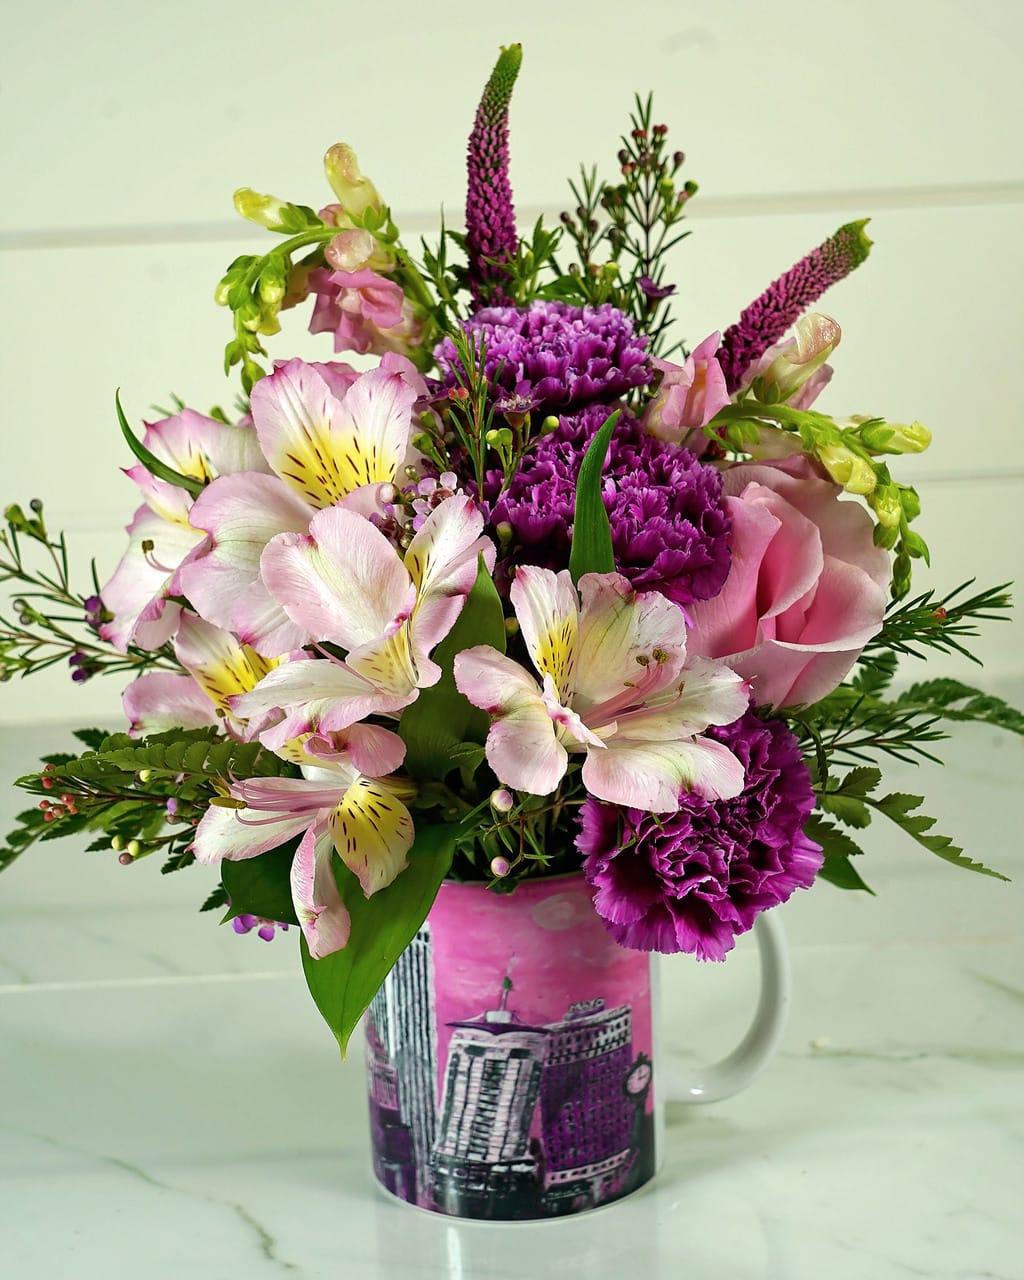 Pink Tulsa Coffee Mug by Rathbone's Flowers